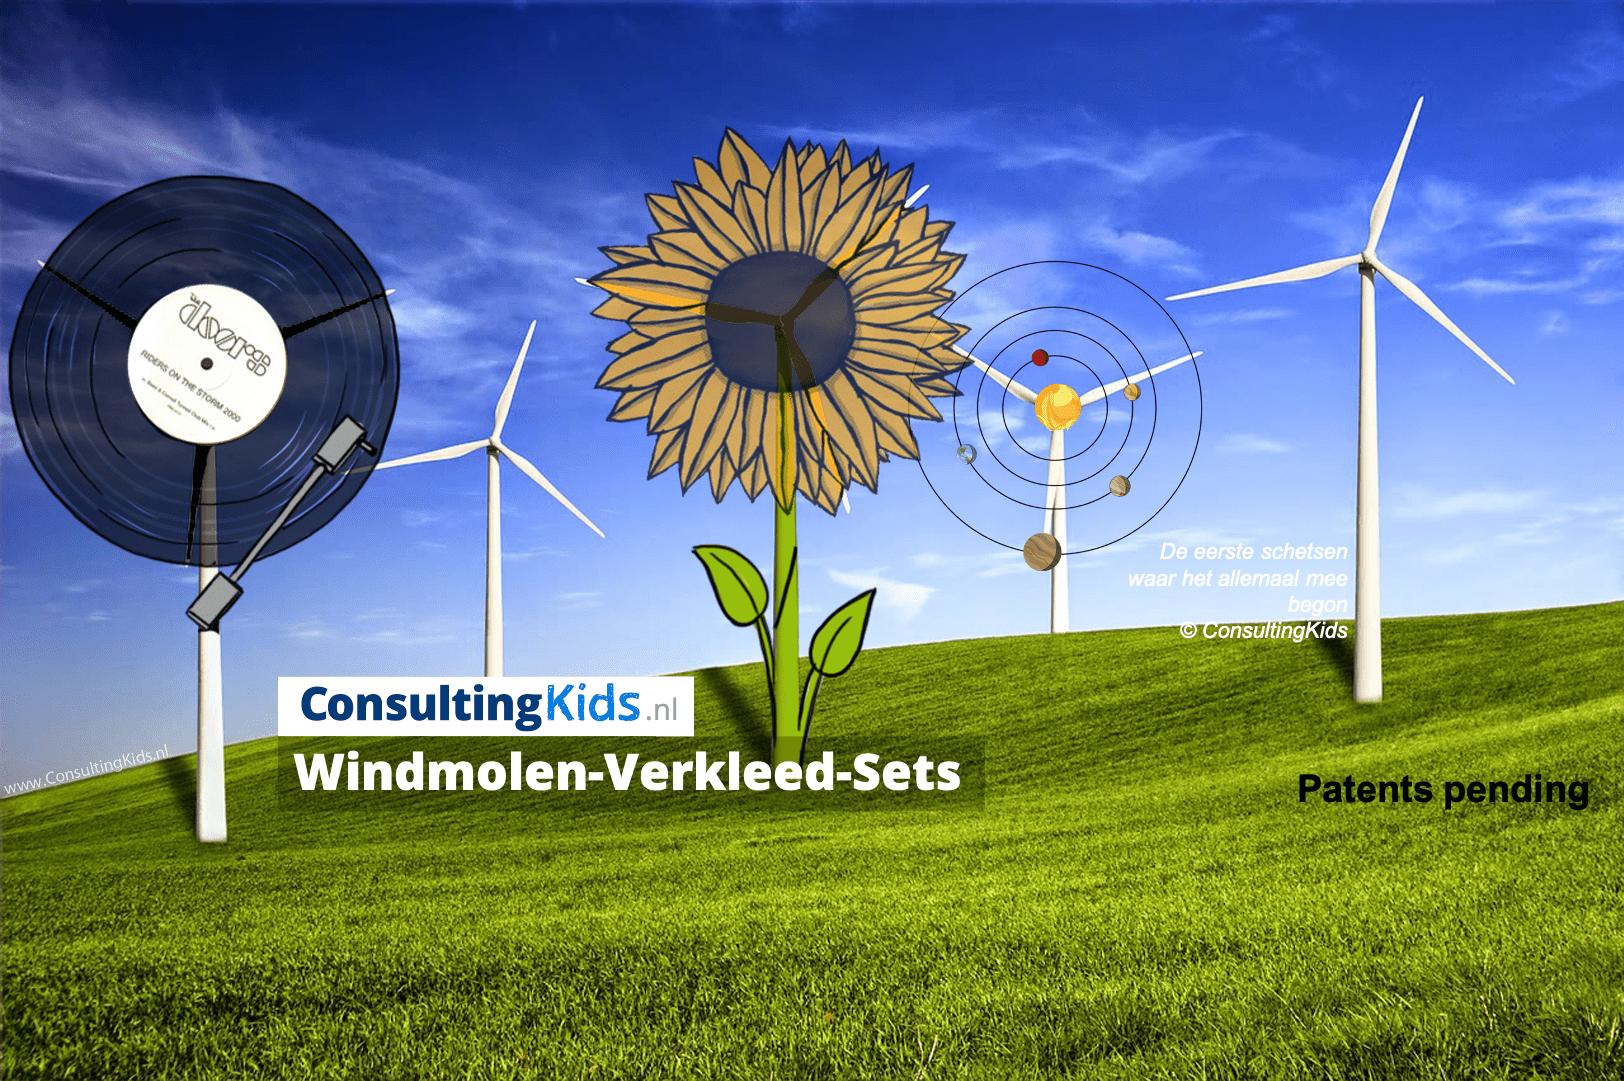 Windmolen_Verkleed_Sets ConsultingKids_NL